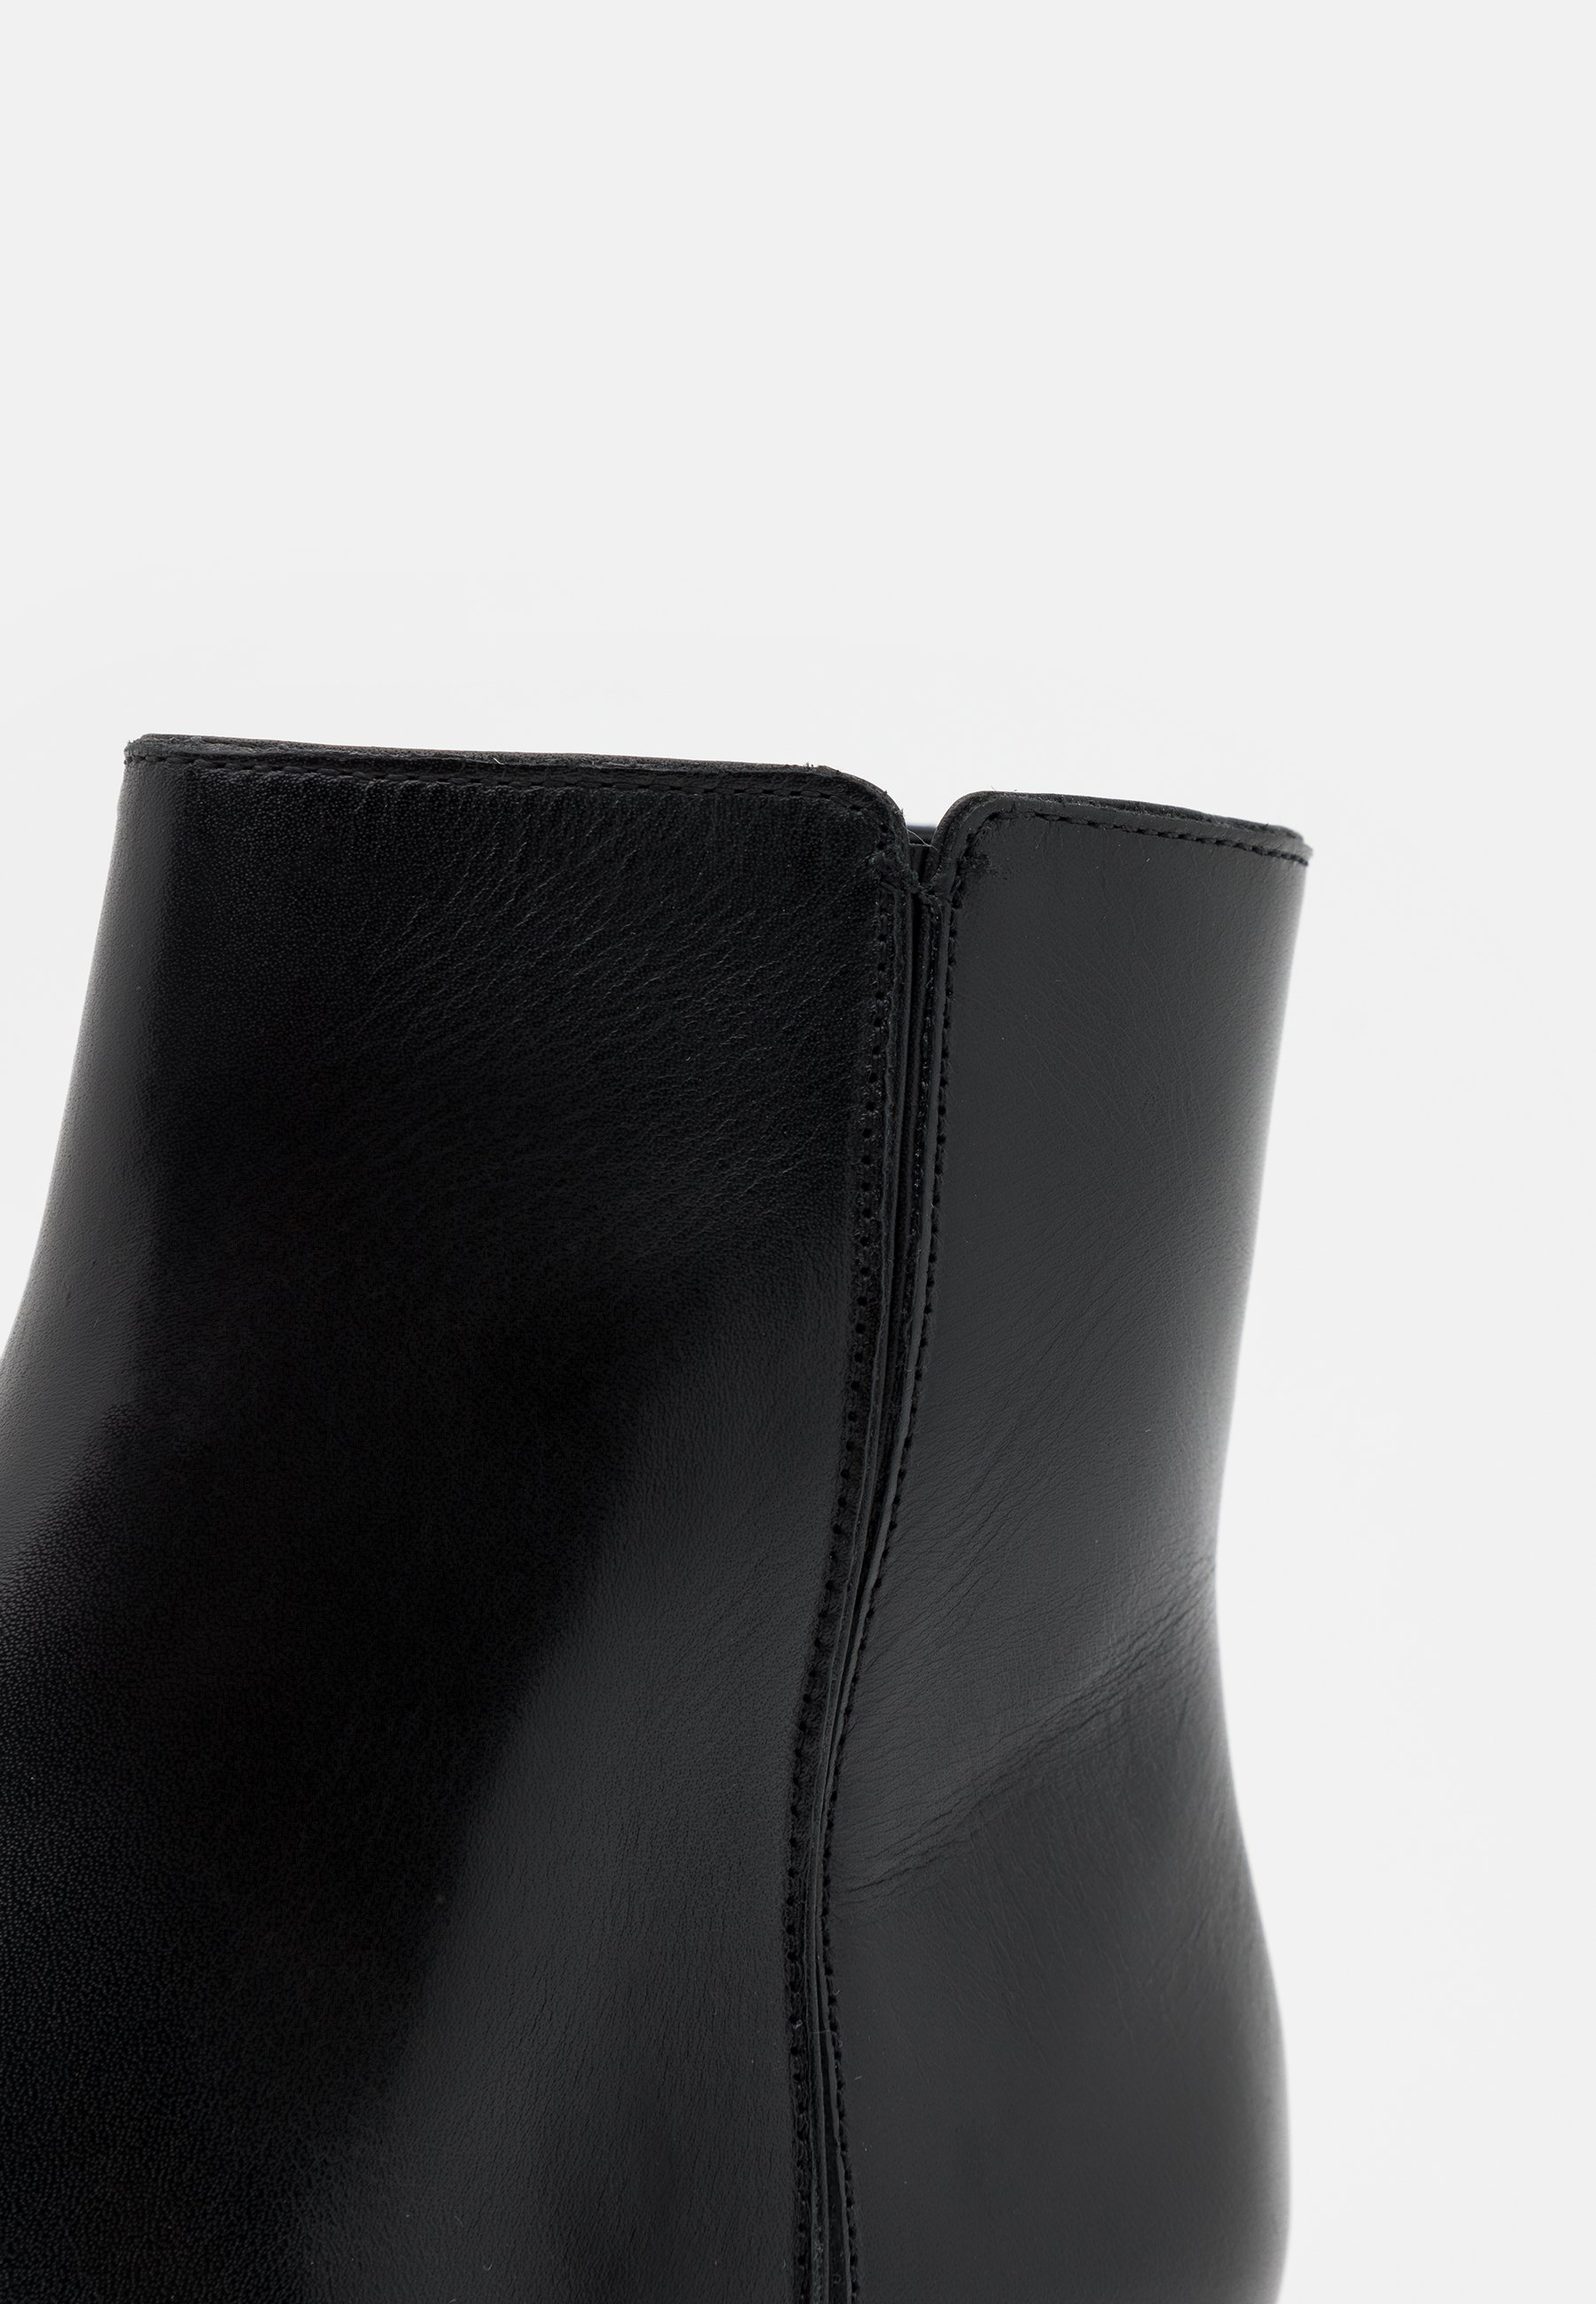 J.CREW BOOT Ankle Boot black/schwarz